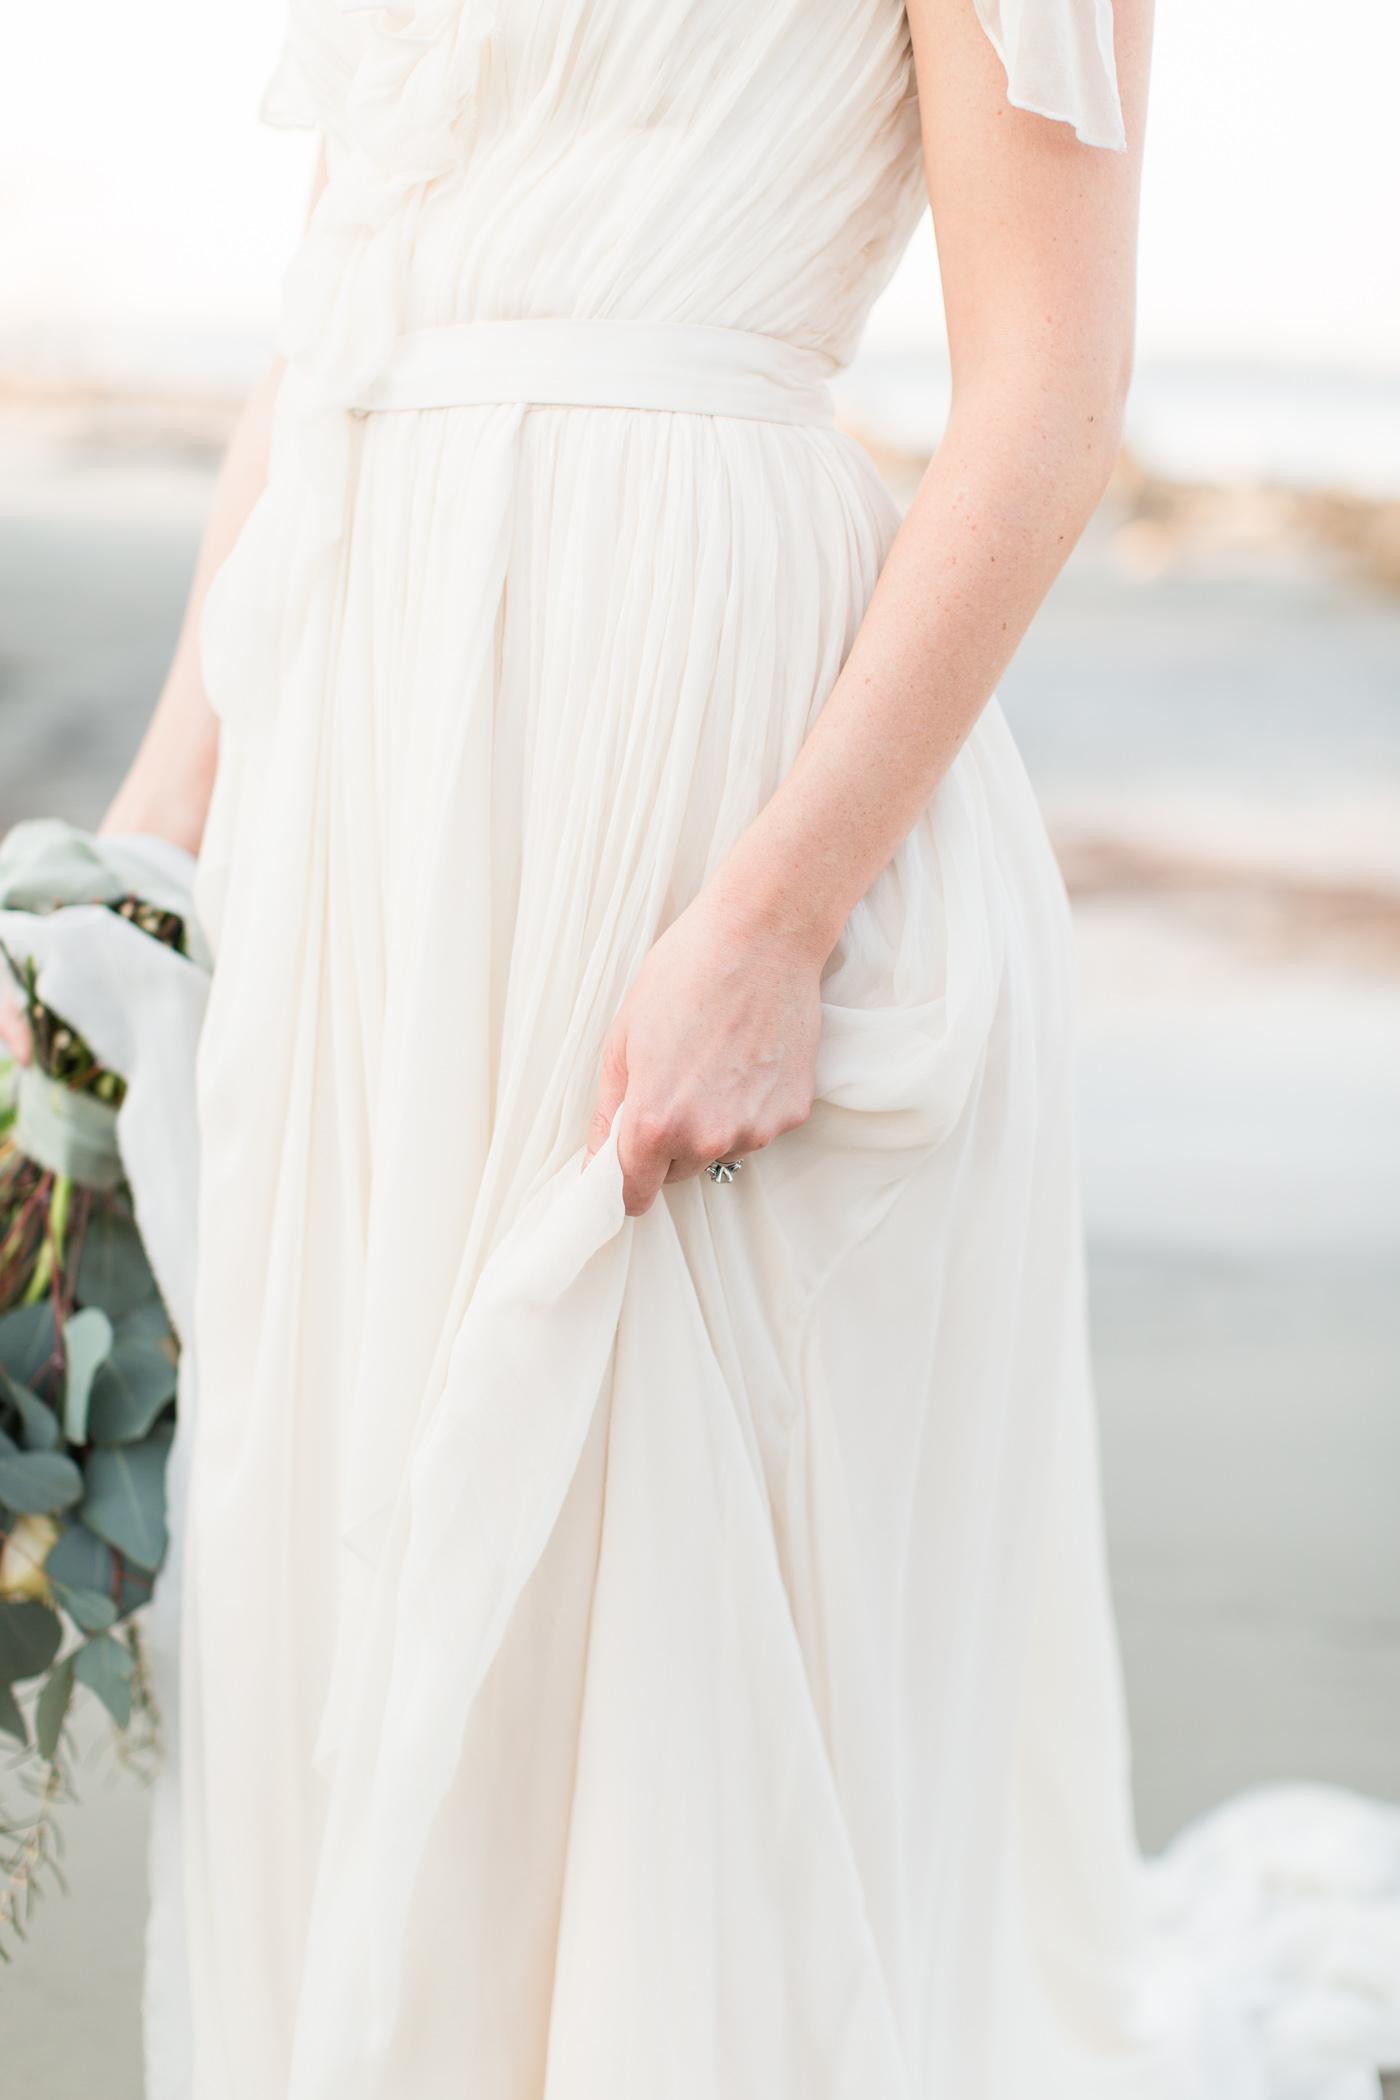 Destination-wedding-photographer101sg